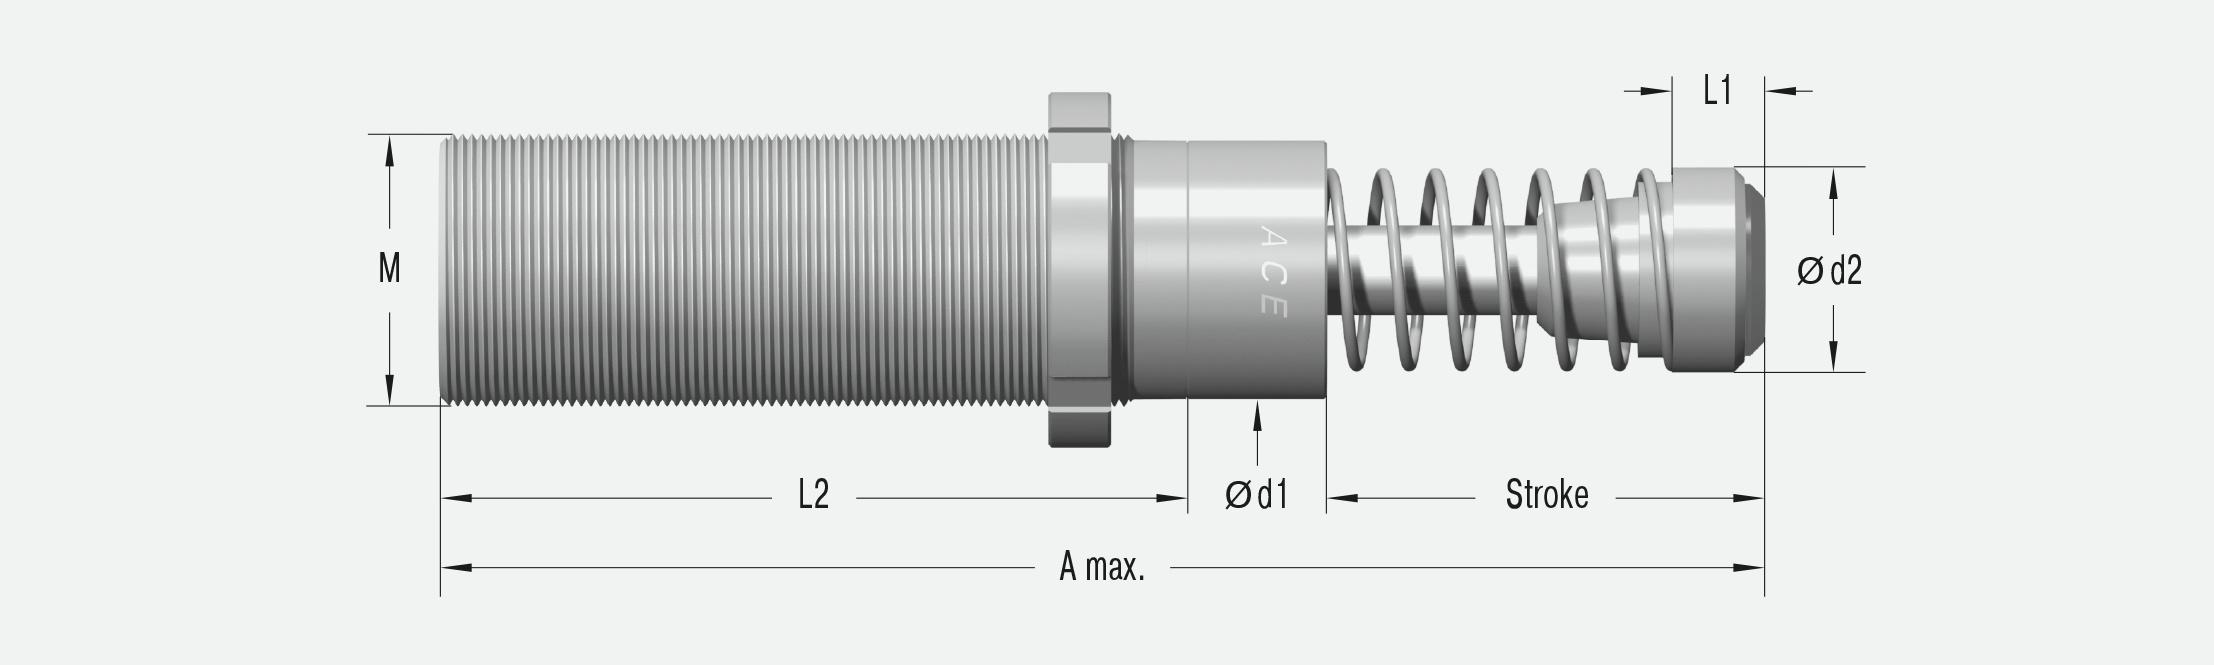 MC3325EUM-1-V4A